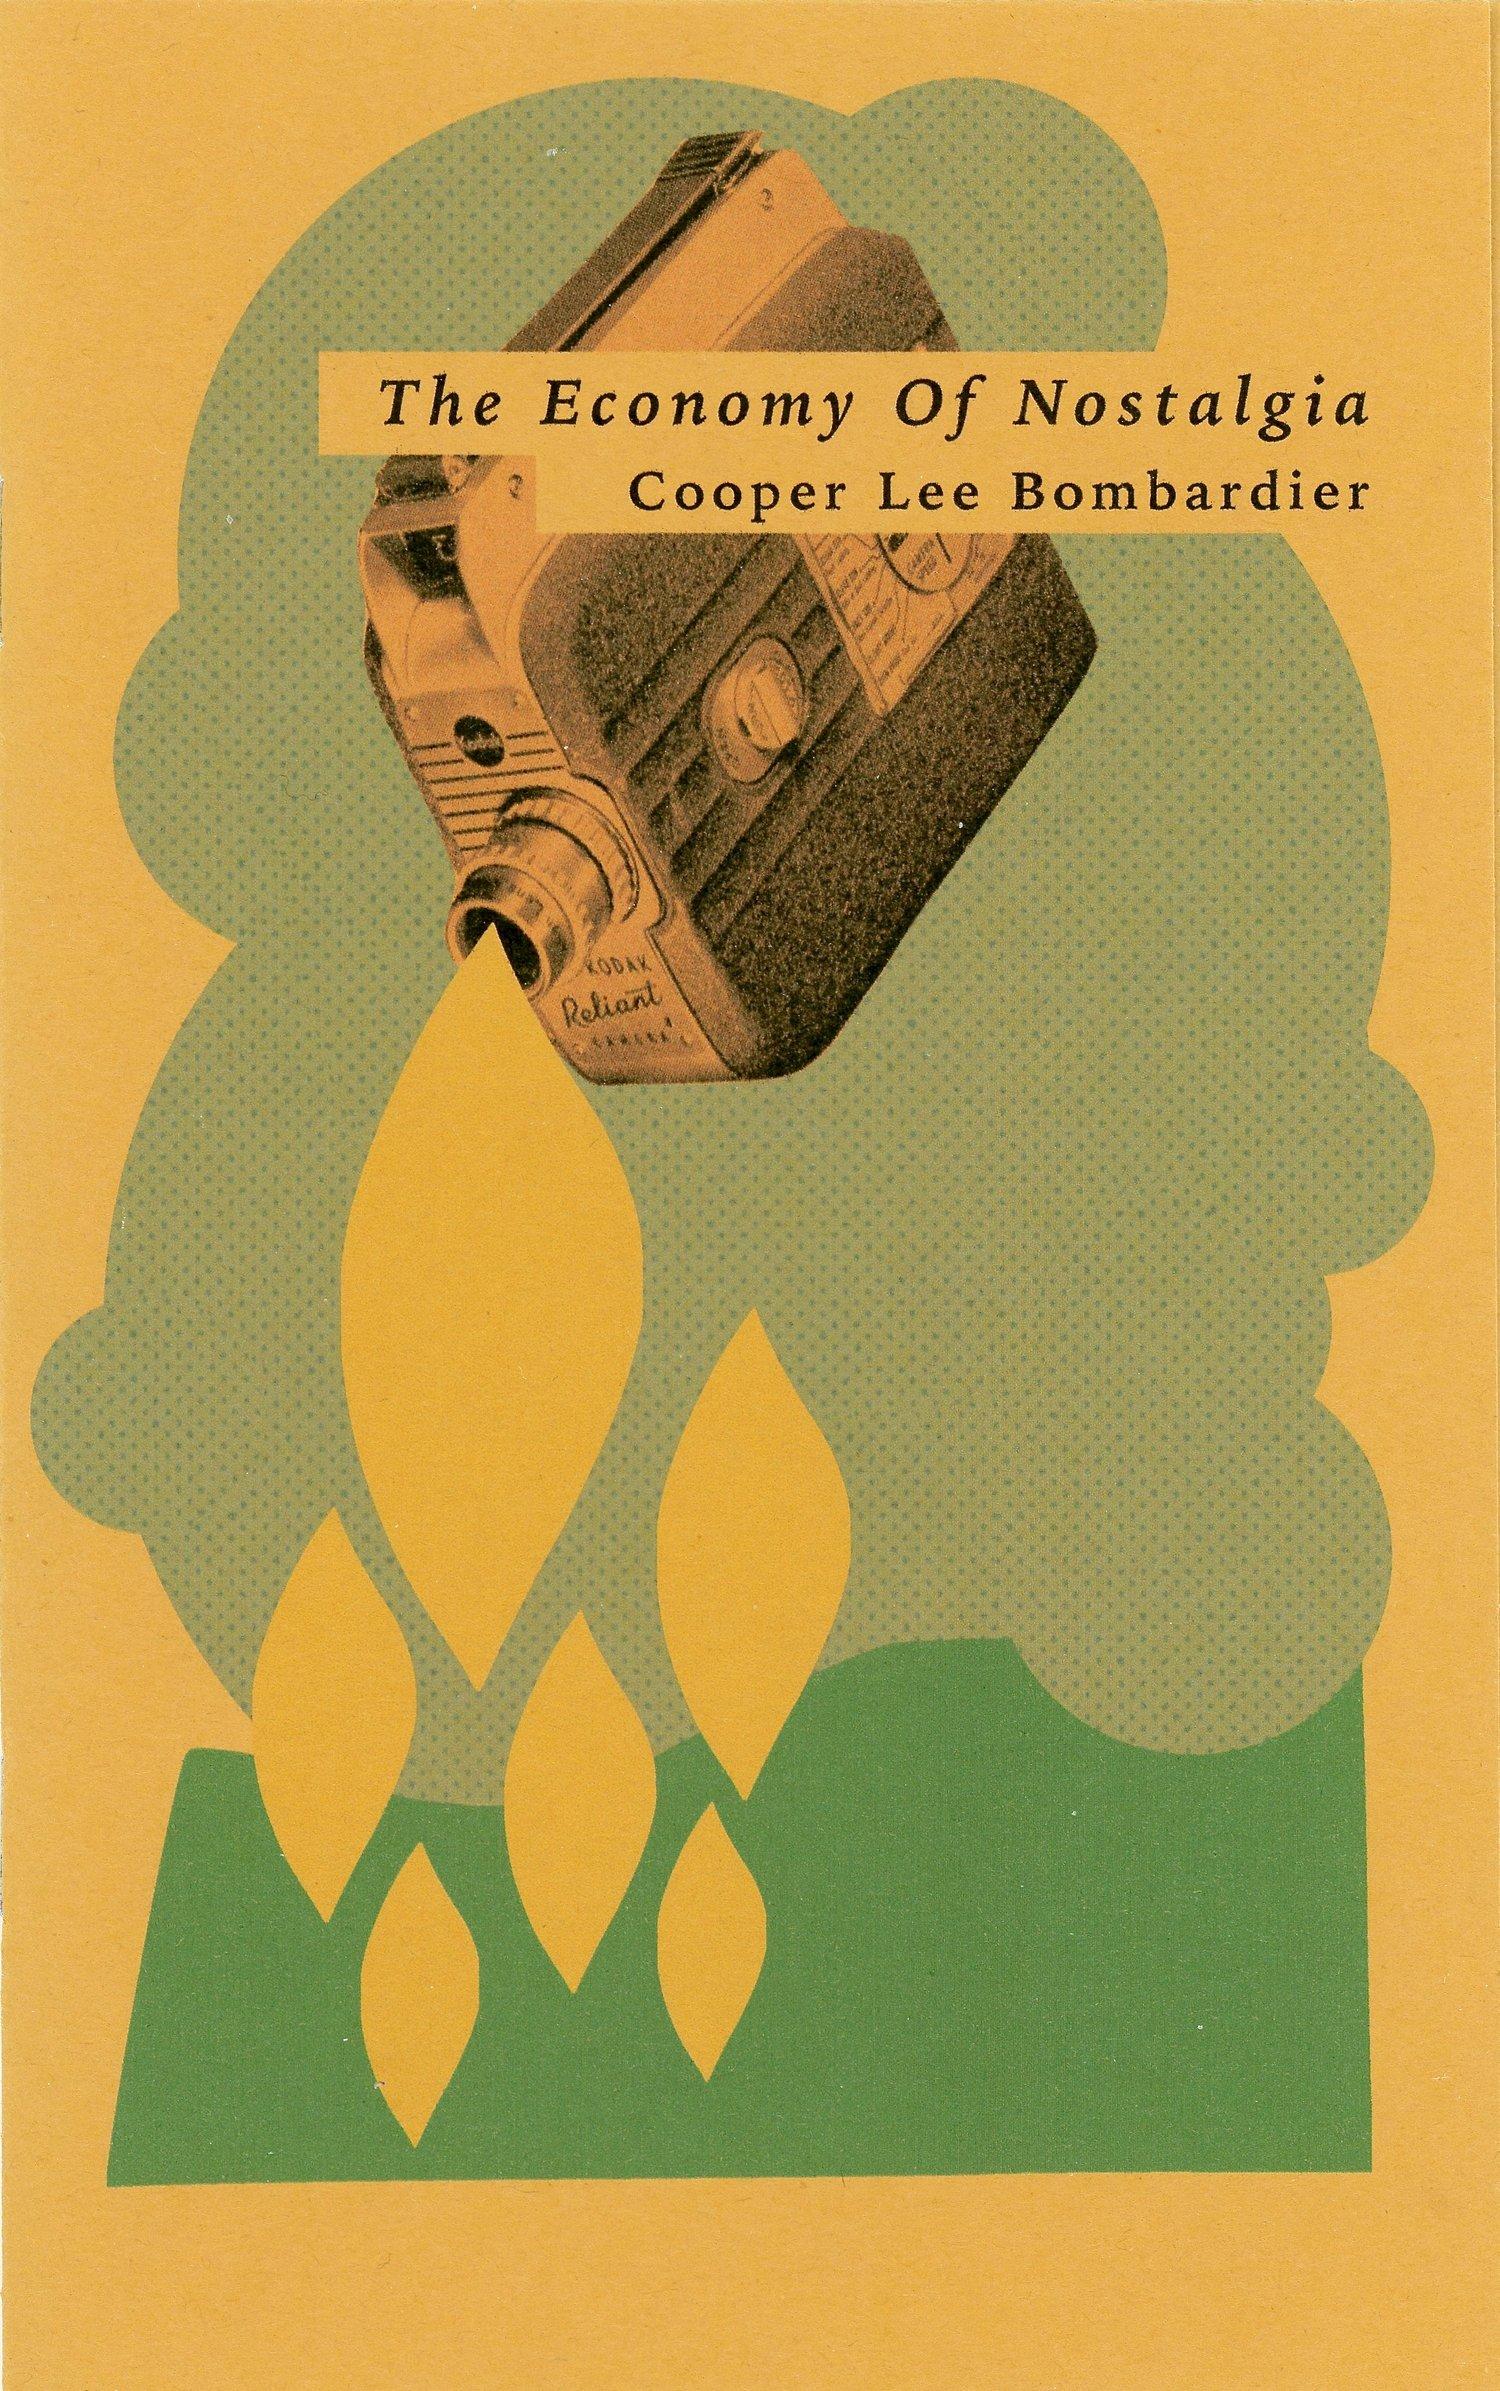 Image of Economy of Nostalgia by Cooper Lee Bombardier